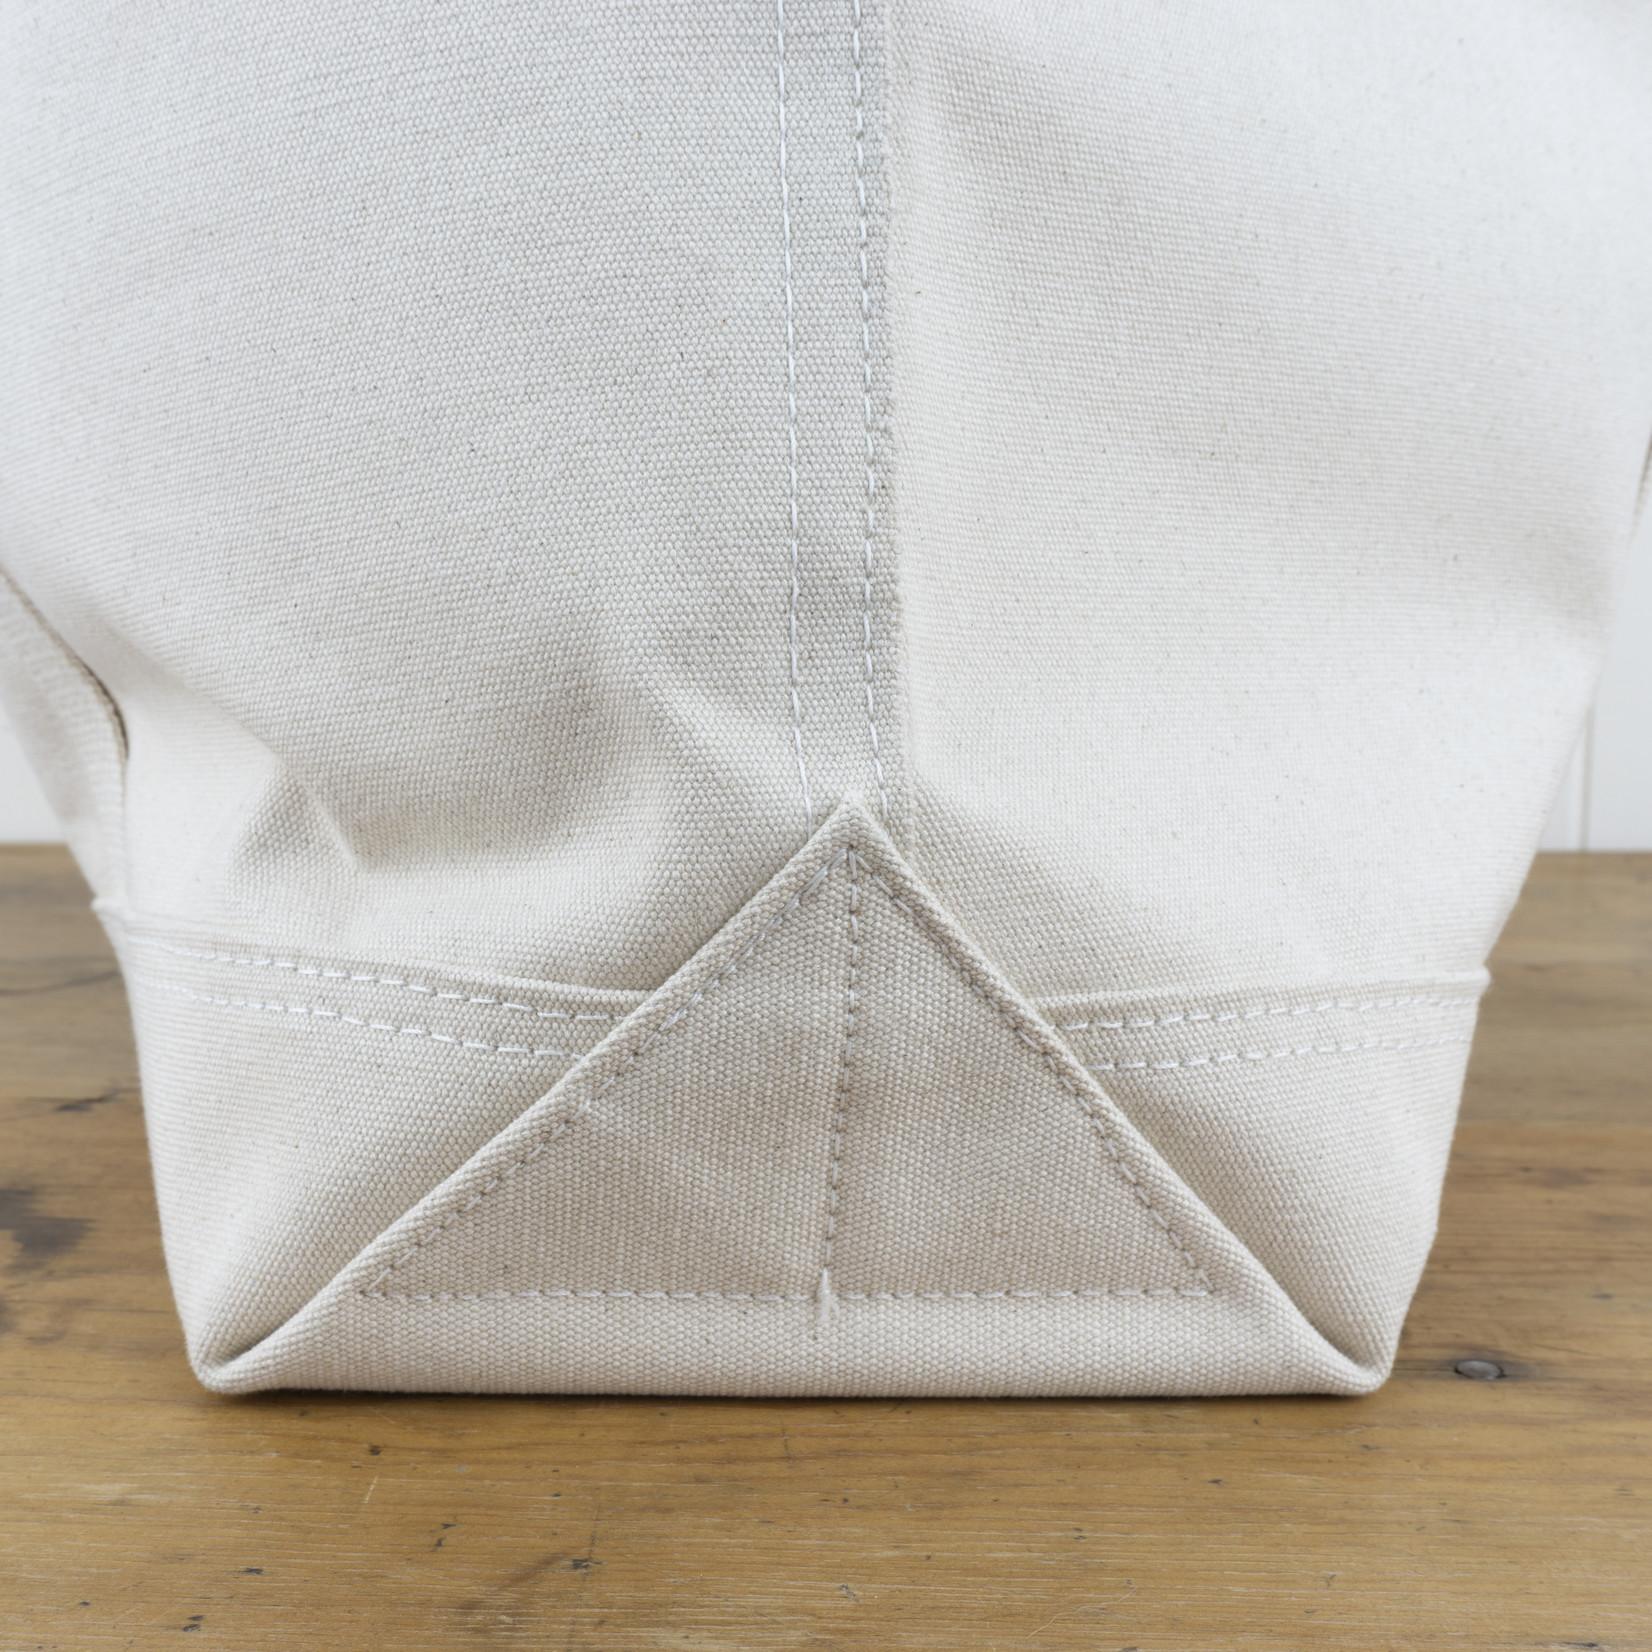 Sturdy Canvas Tote - medium